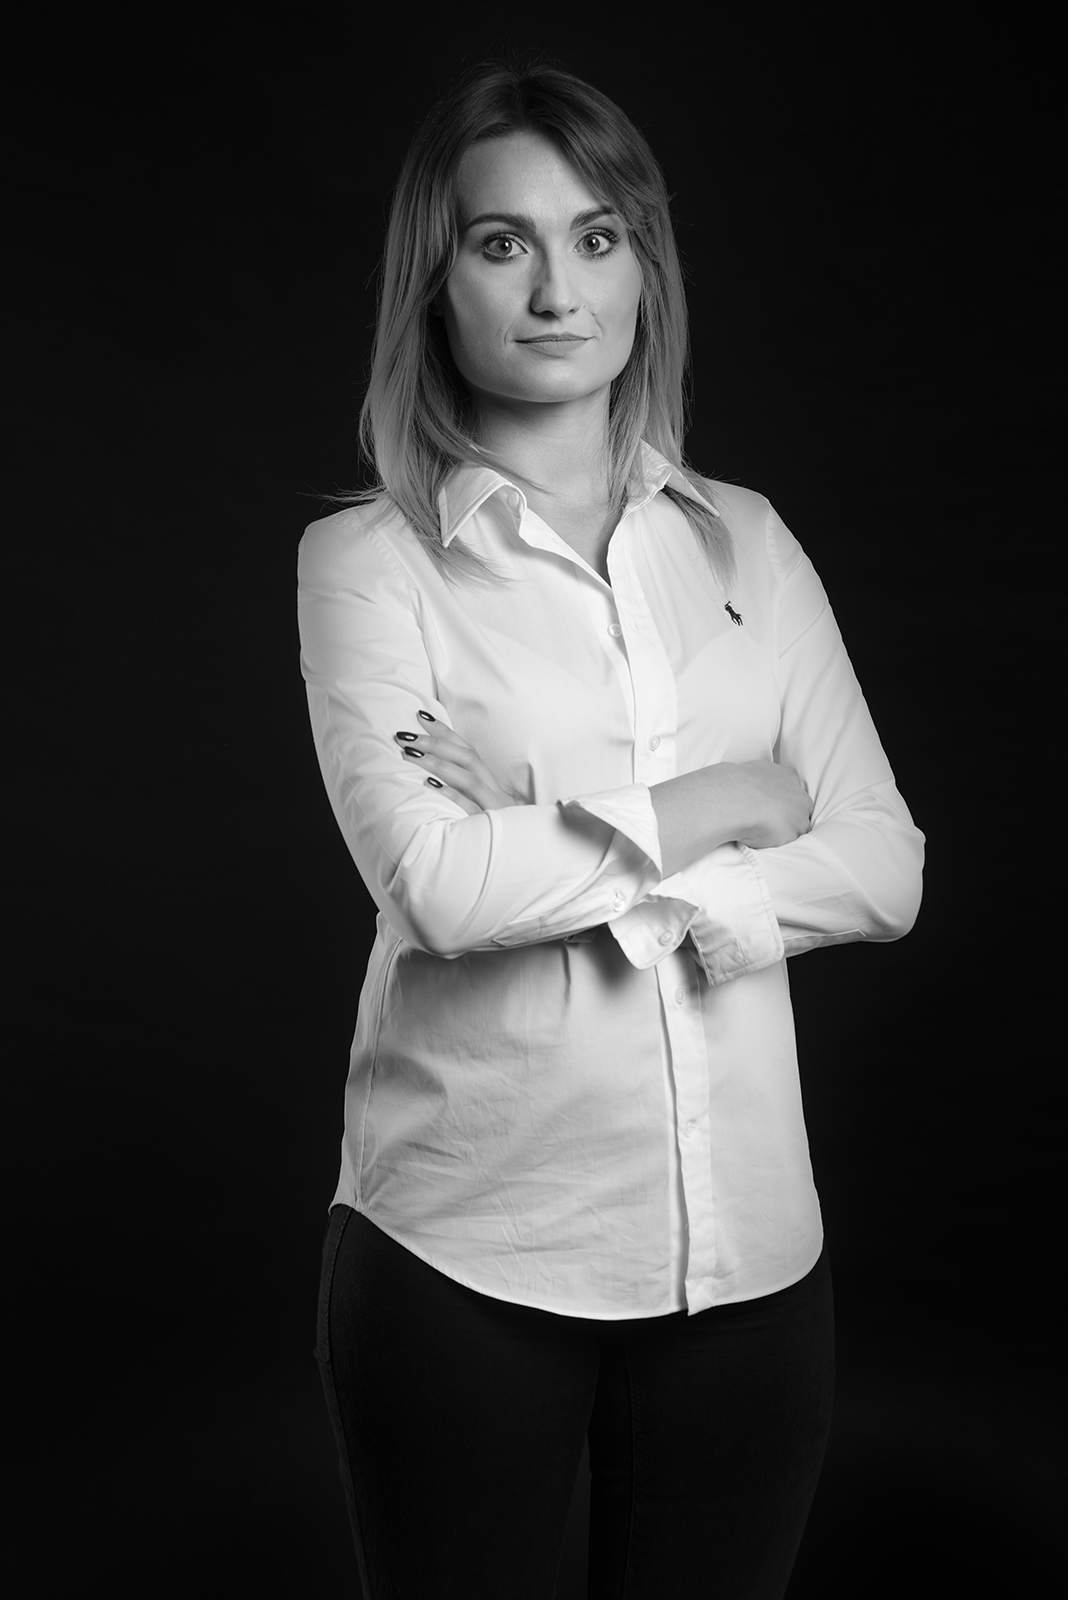 Aleksandra Gierlińska